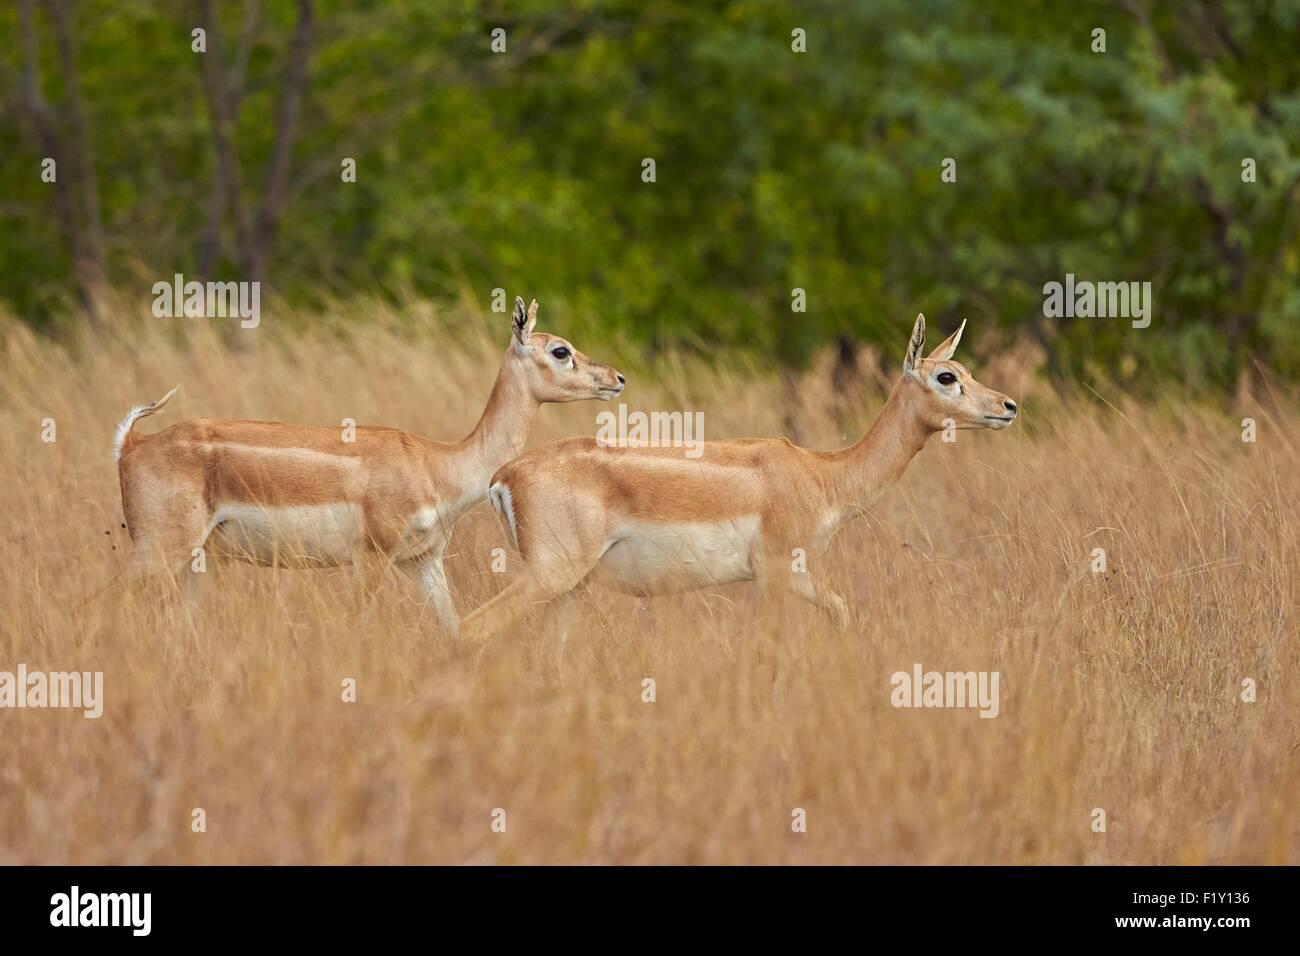 India, Gujarat state, Blackbuck national park, Blackbuck (Antilope cervicapra), female - Stock Image